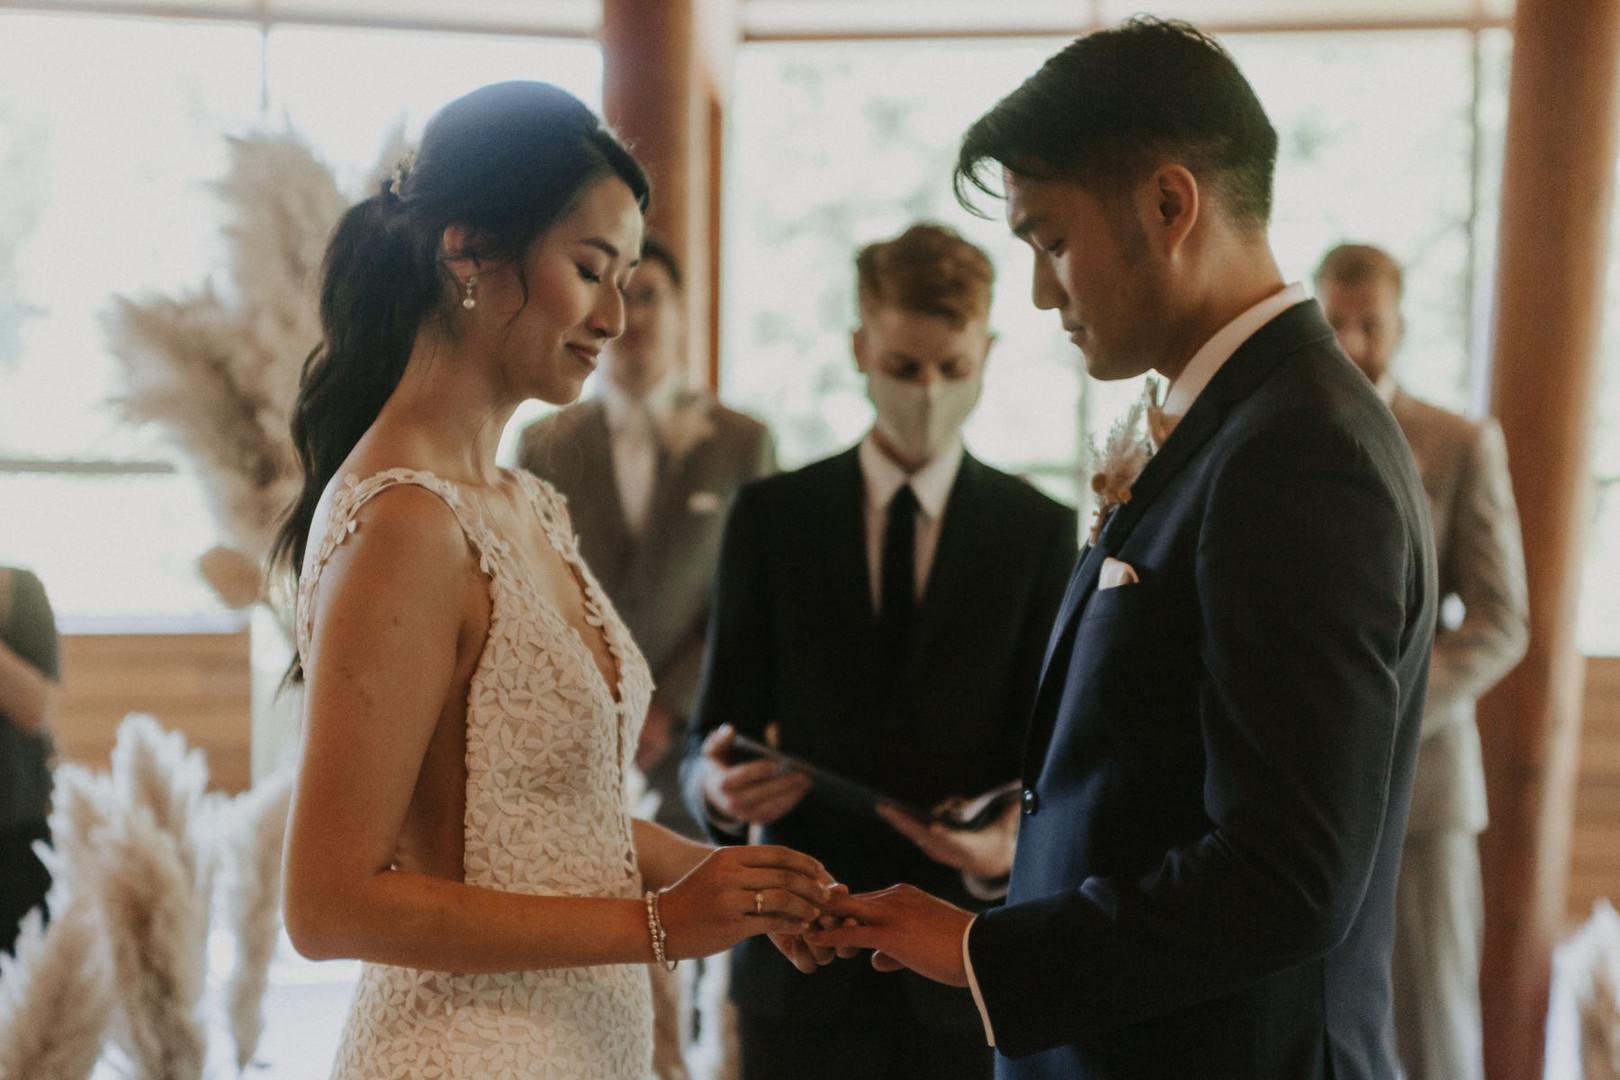 20200815_AME_AmandaLewis_Wedding_Web-366